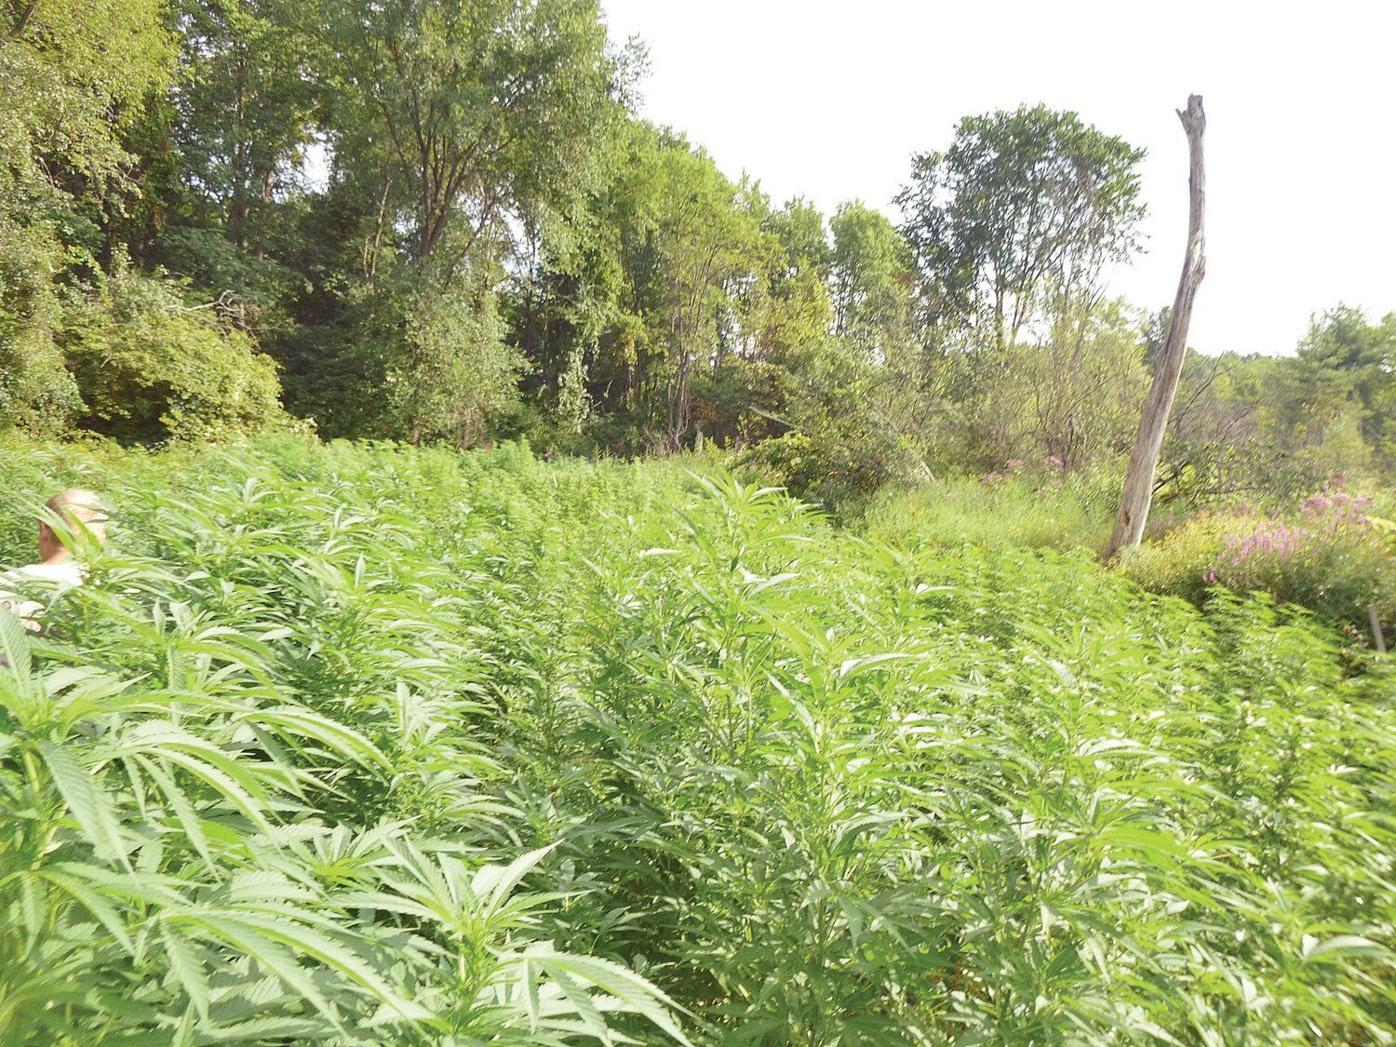 Nearly 500 marijuana plants found - and burned - in West Stockbridge